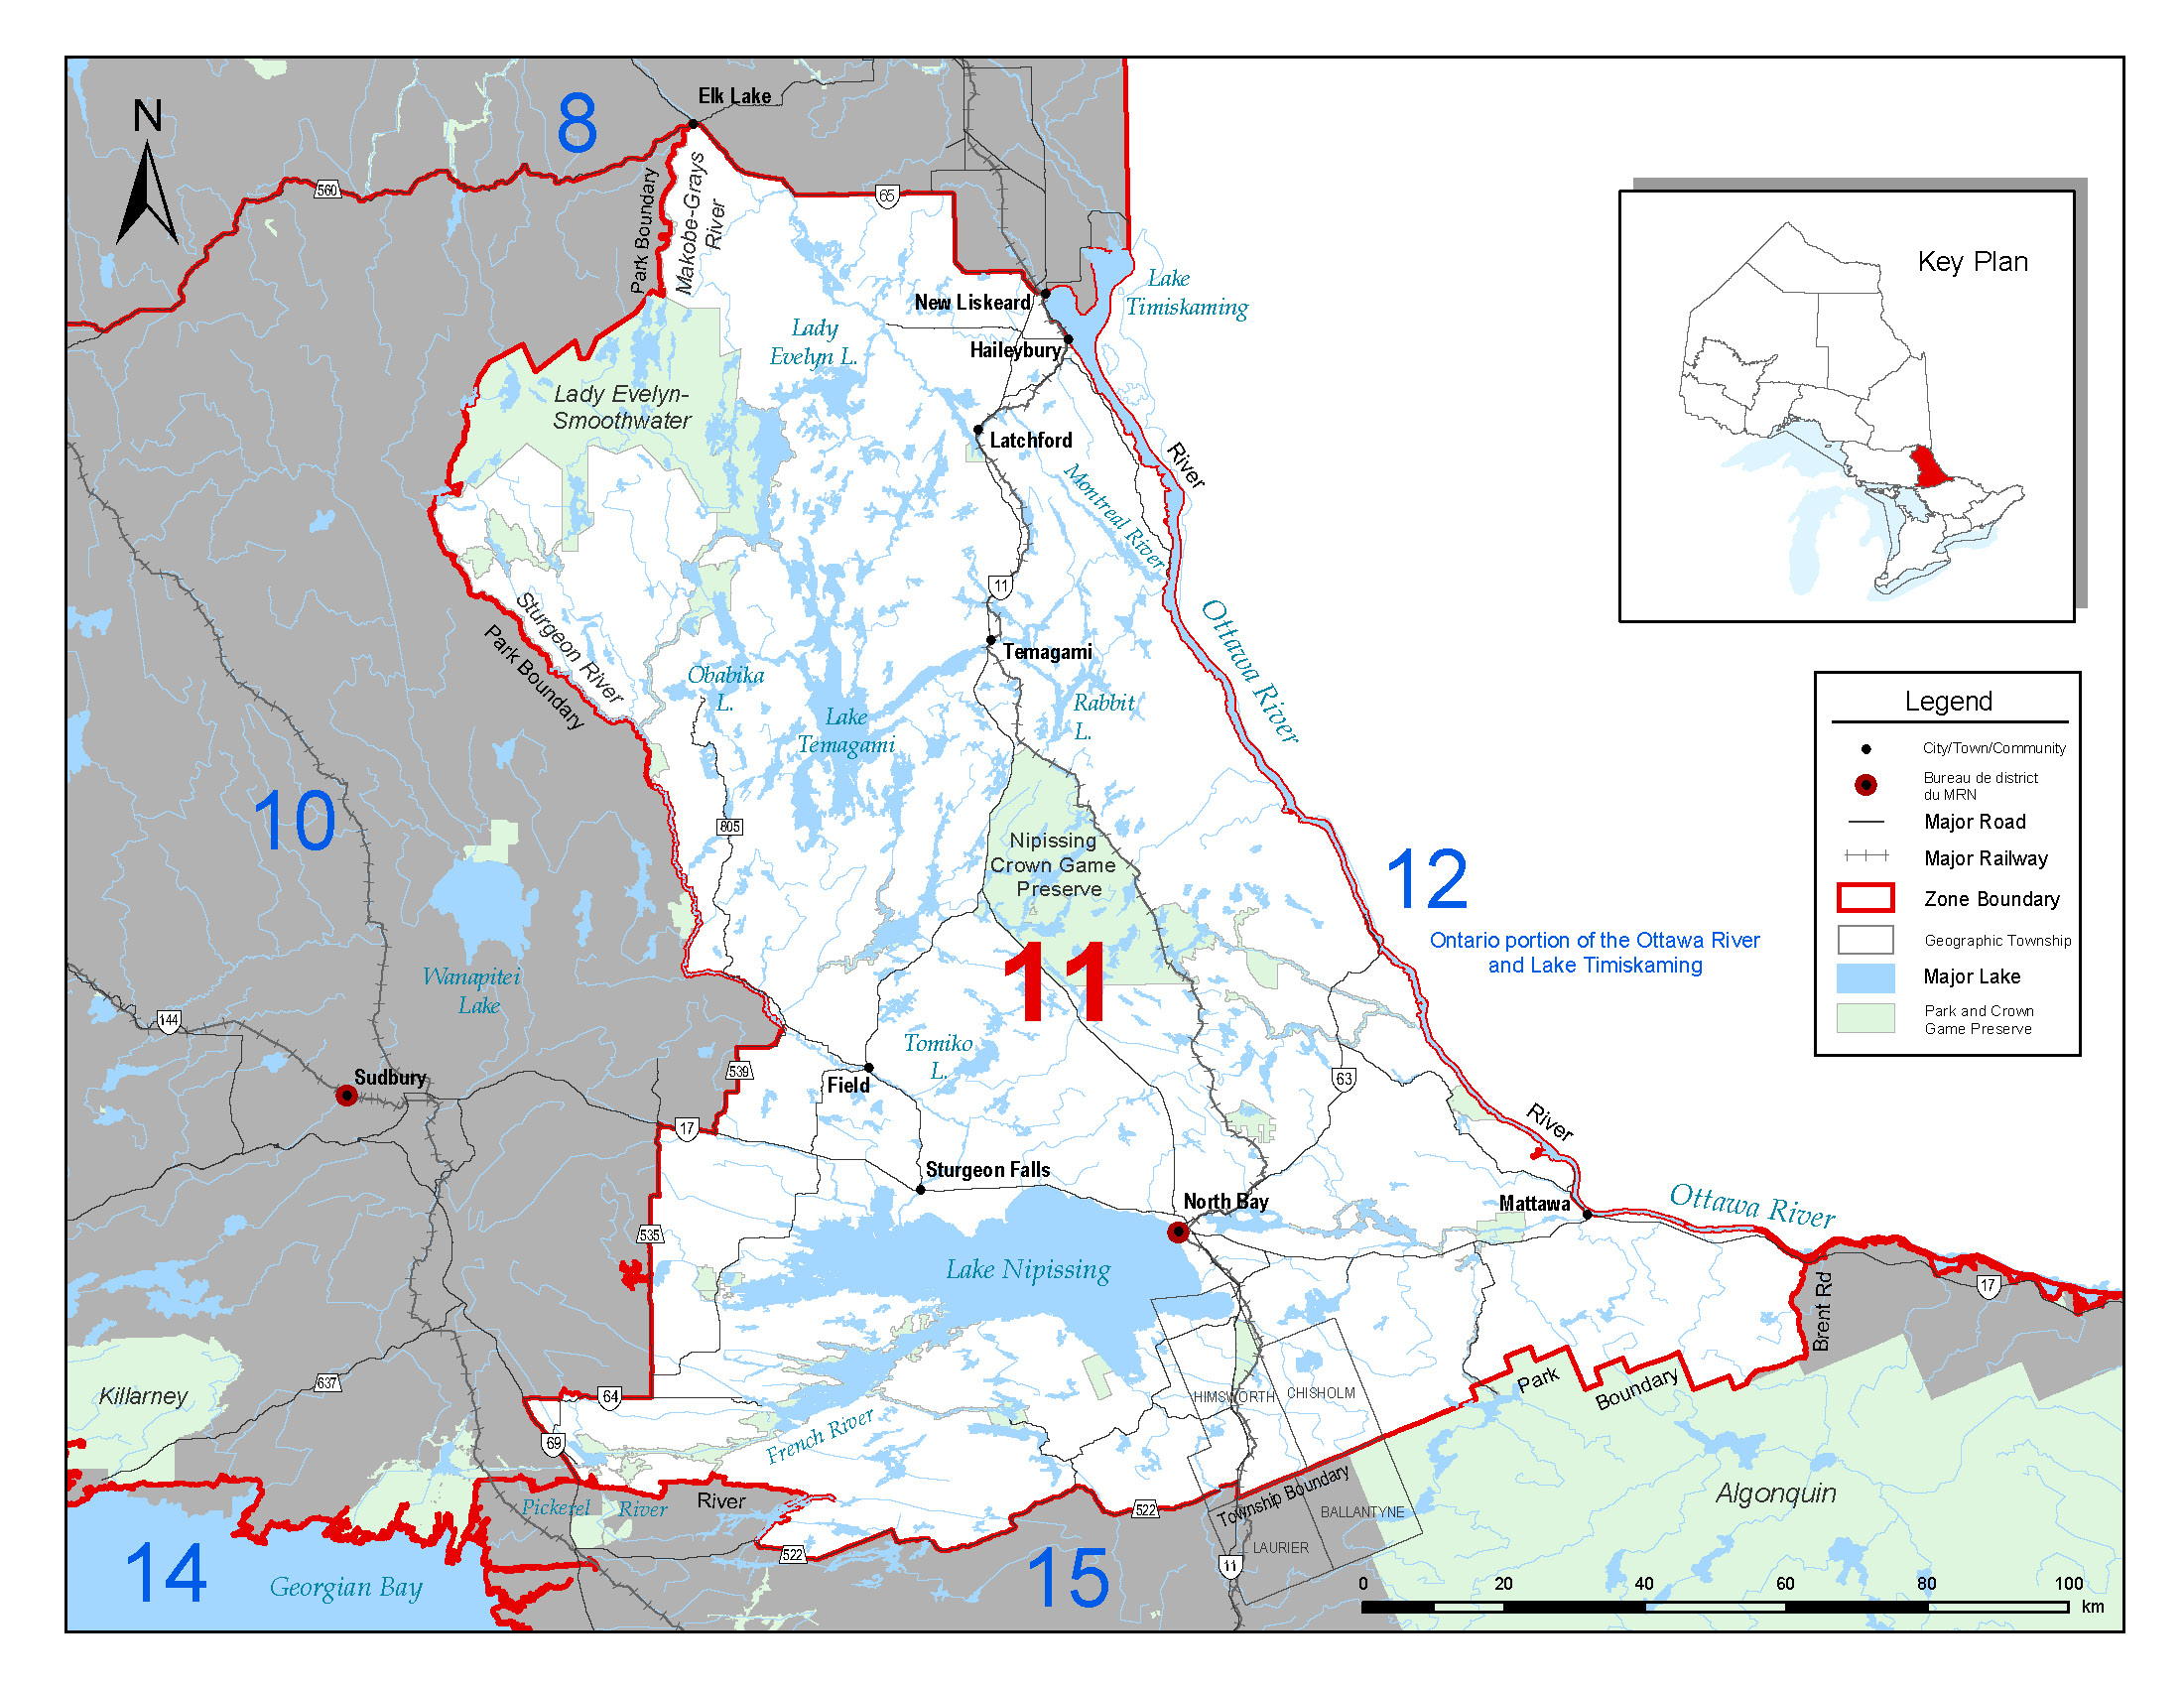 Fisheries management zone 11 fmz 11 for Ontario fishing license